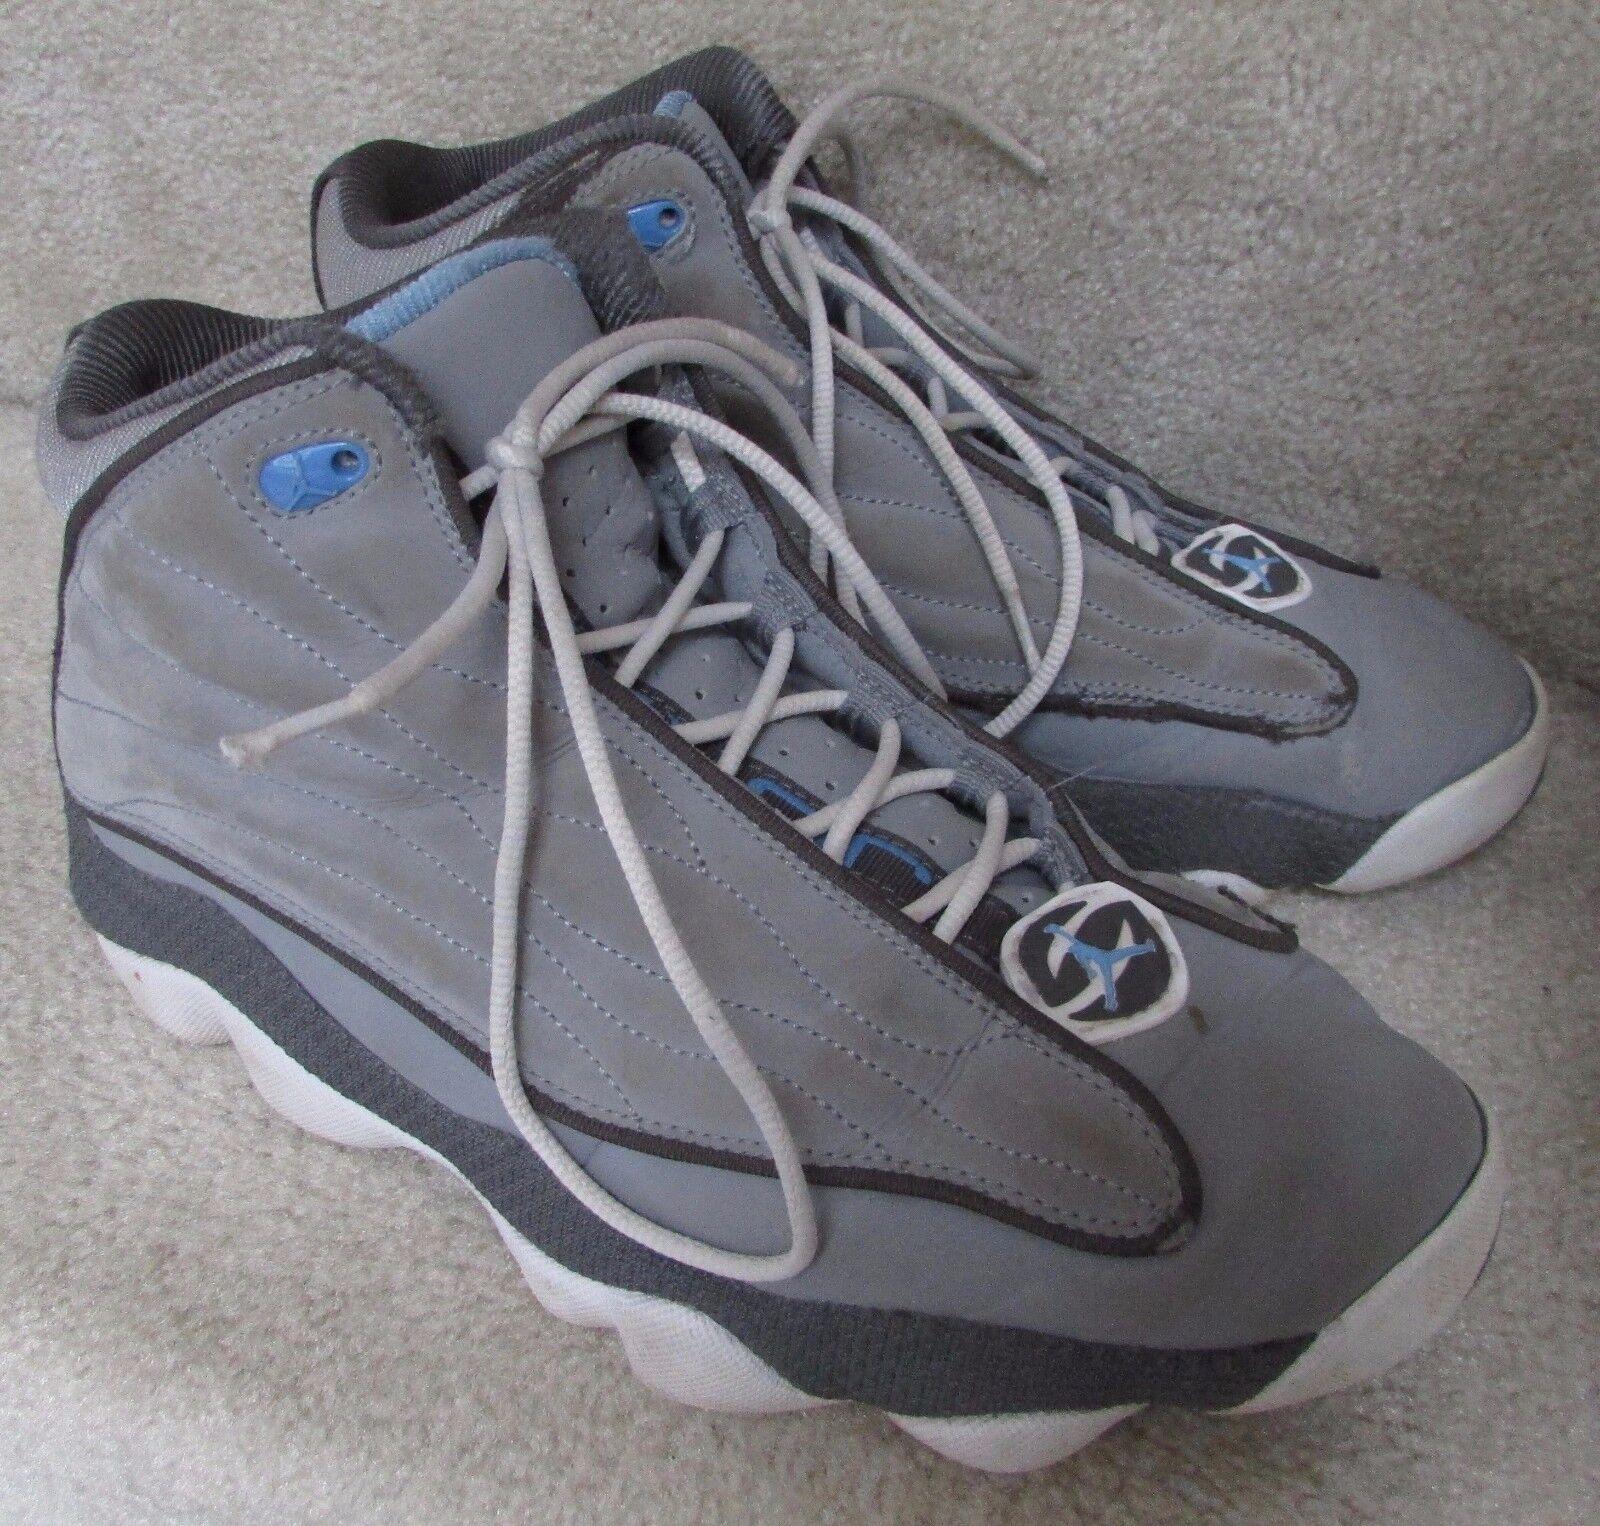 Nike Mens Jordan Pro Strength Basketball Shoes Sneakers Comfortable Seasonal clearance sale